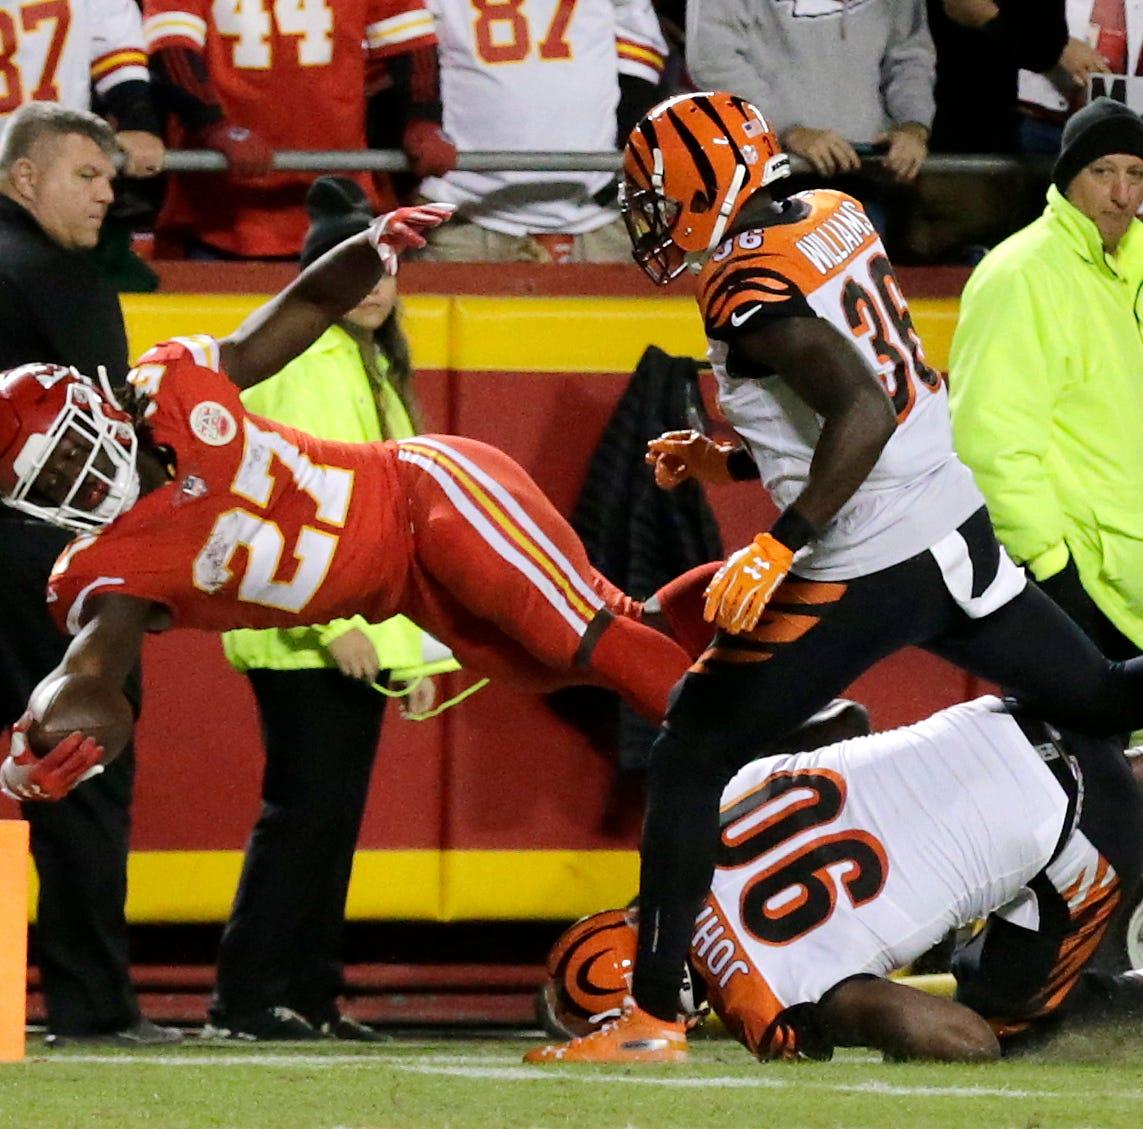 Kansas City Chiefs offense rolls in blowout of Cincinnati Bengals on primetime